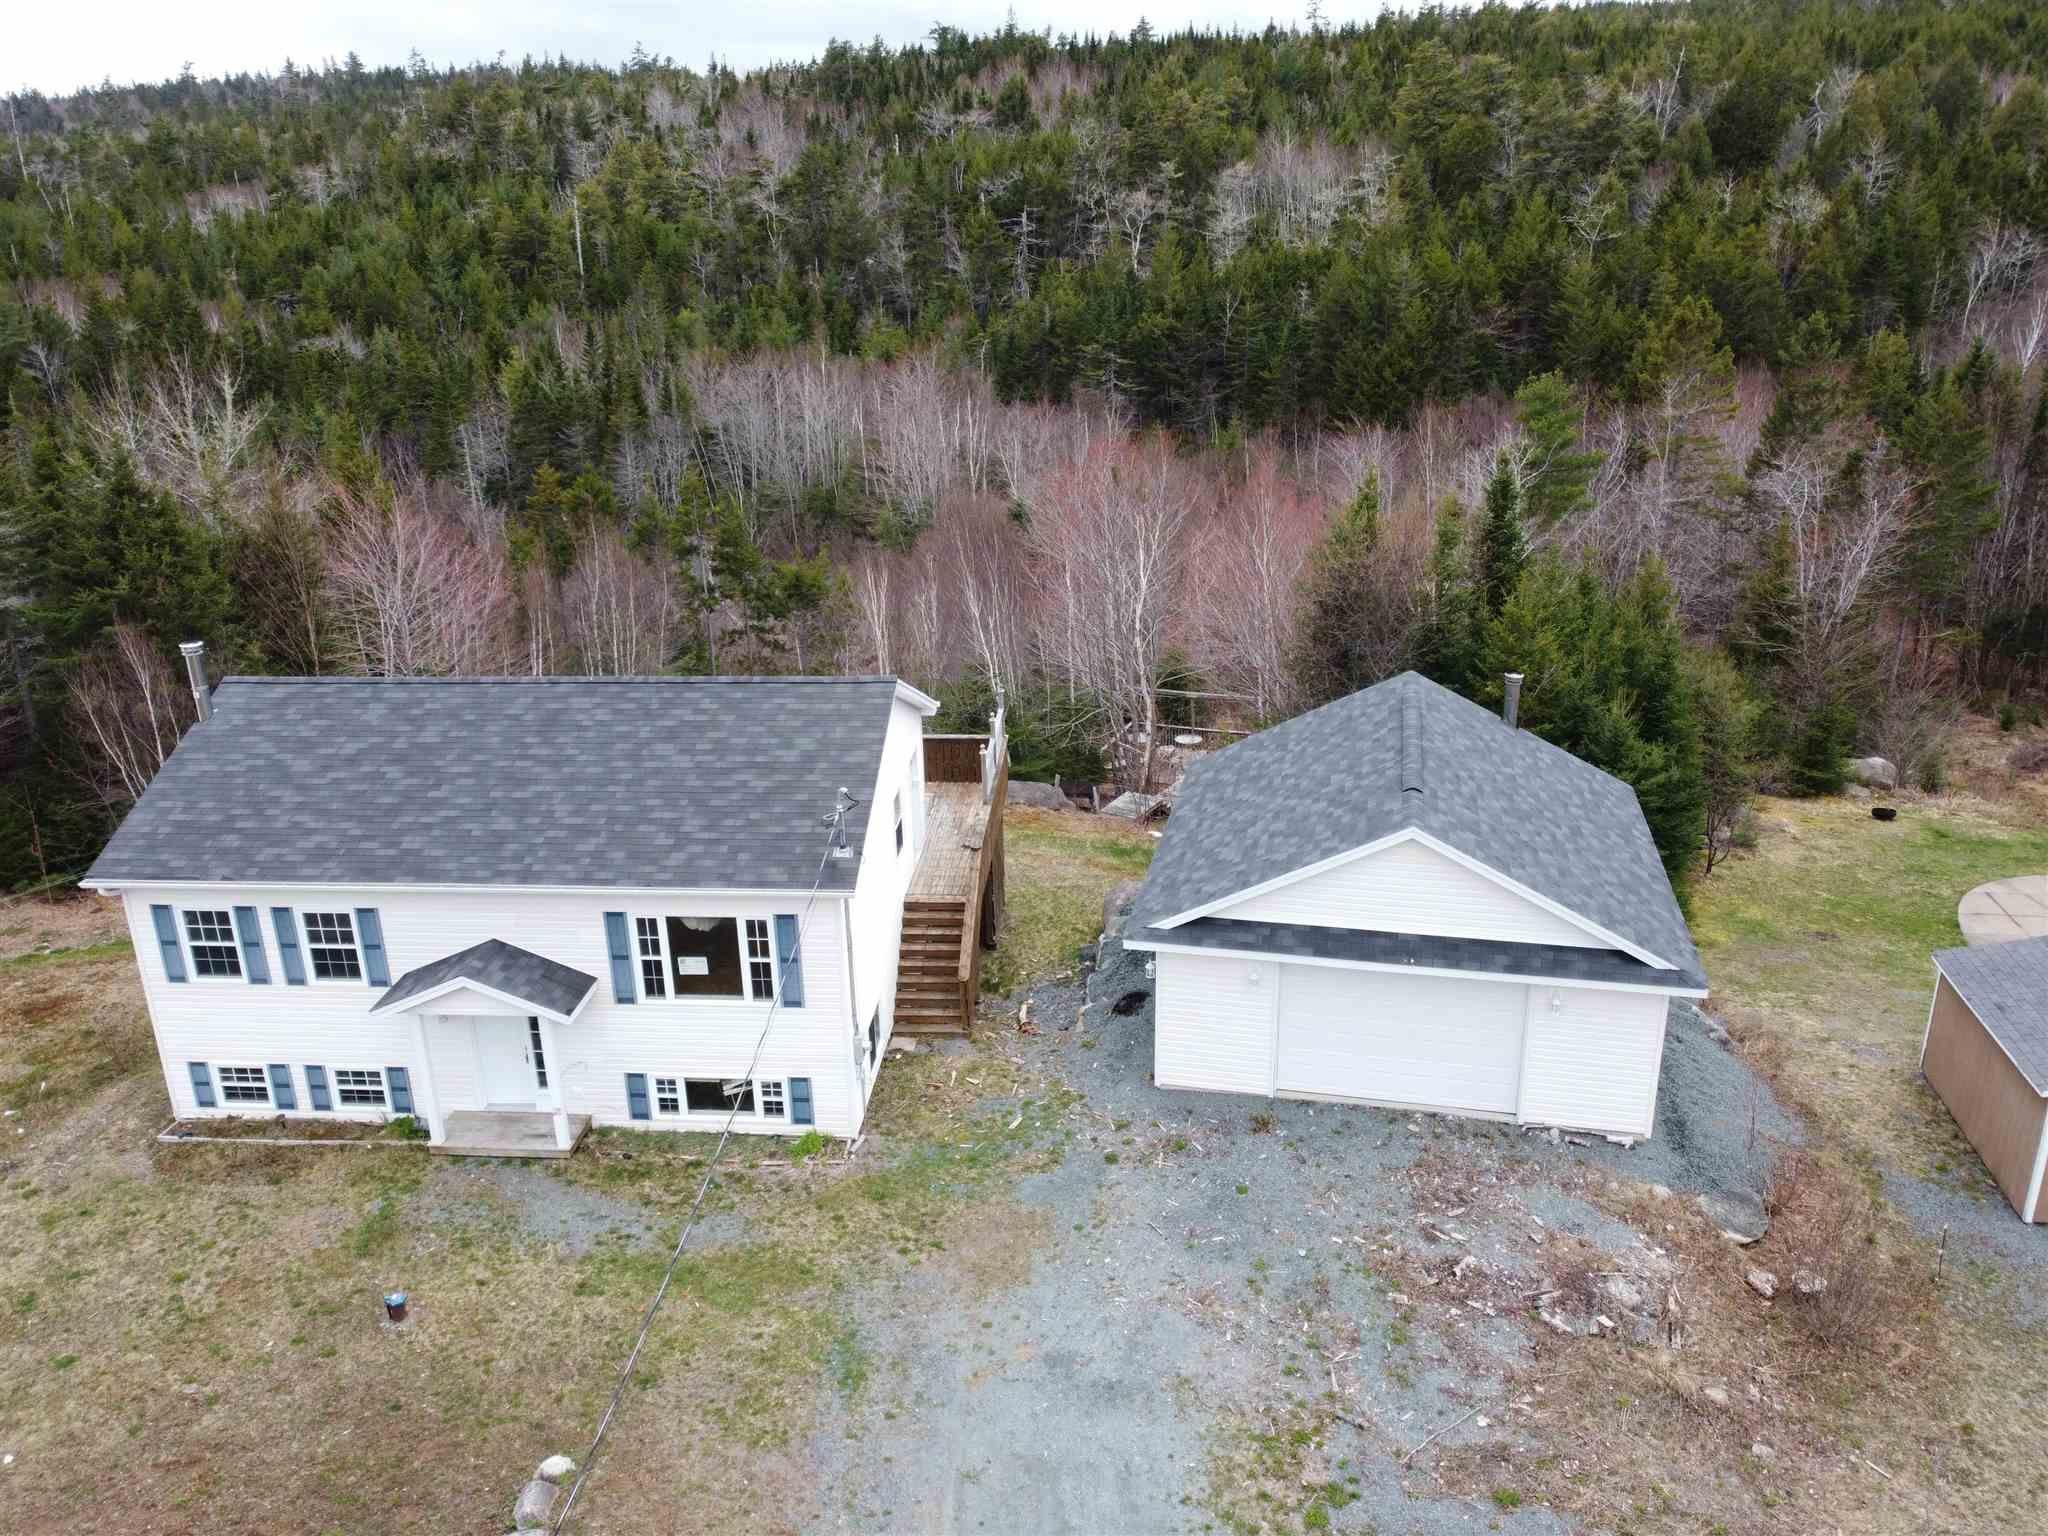 Main Photo: 1536 Myra Road in Porters Lake: 31-Lawrencetown, Lake Echo, Porters Lake Residential for sale (Halifax-Dartmouth)  : MLS®# 202111472